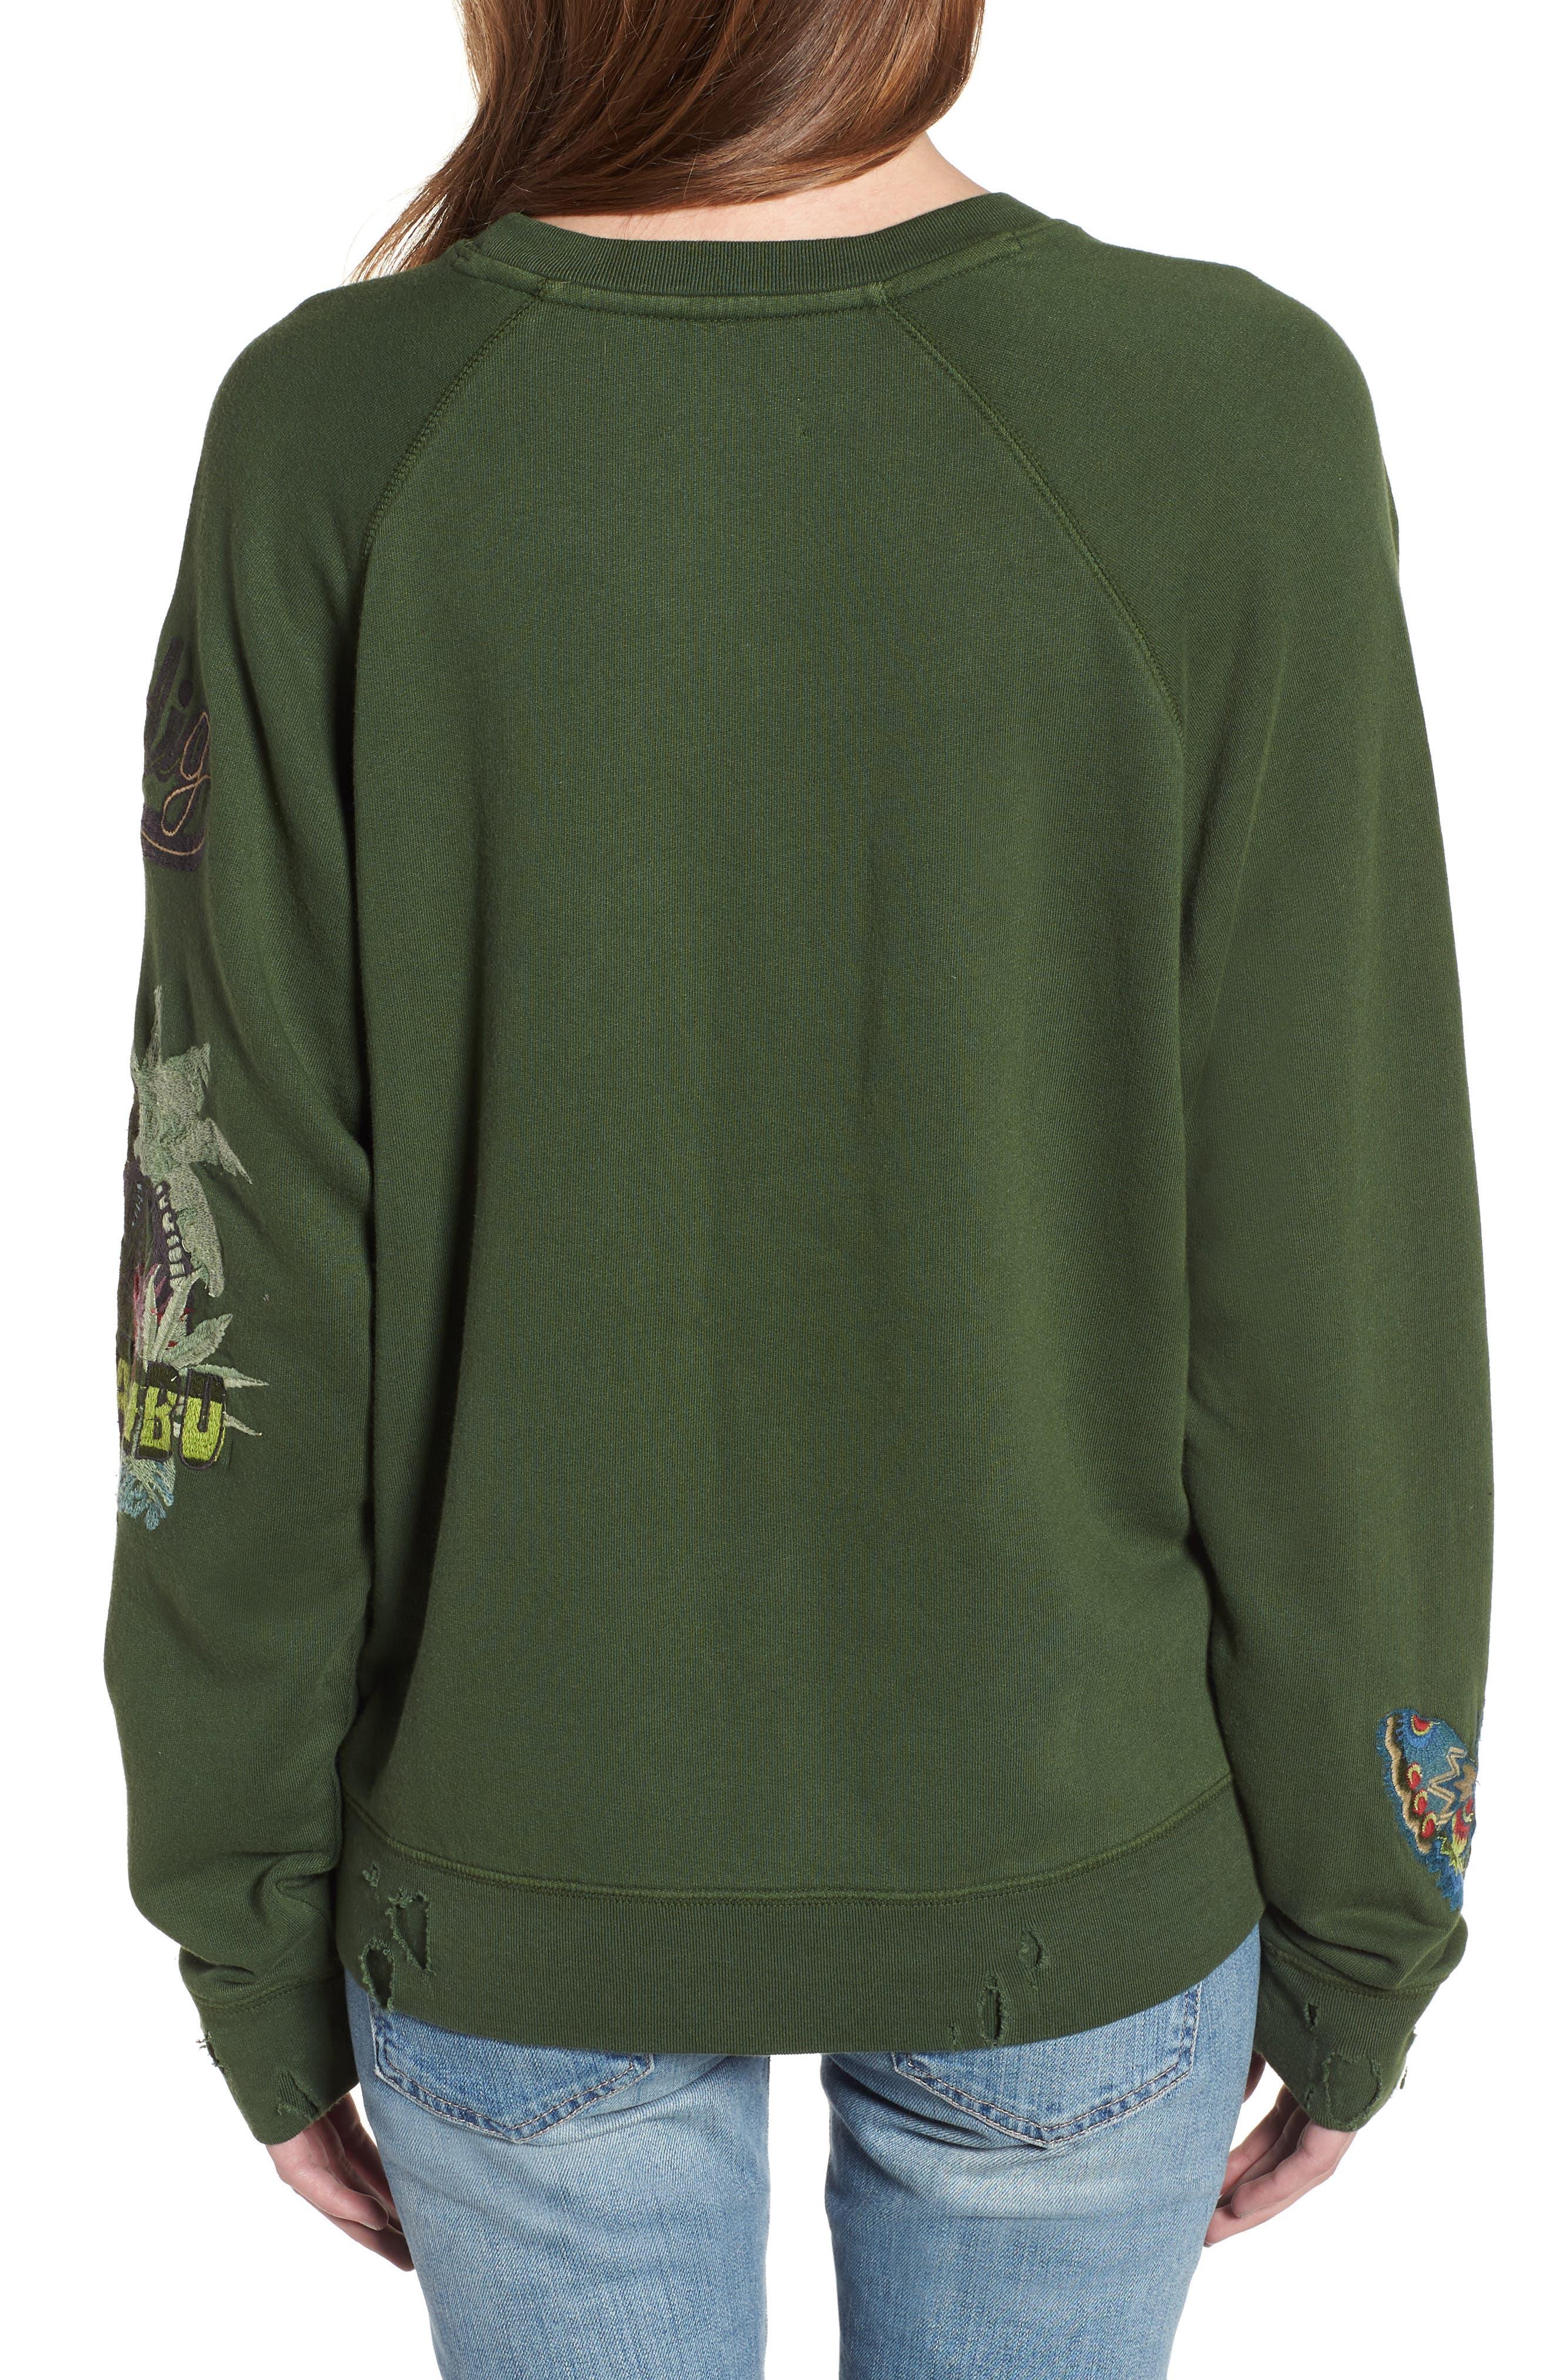 Upper Bis Brode Sweatshirt,                             Alternate thumbnail 2, color,                             340